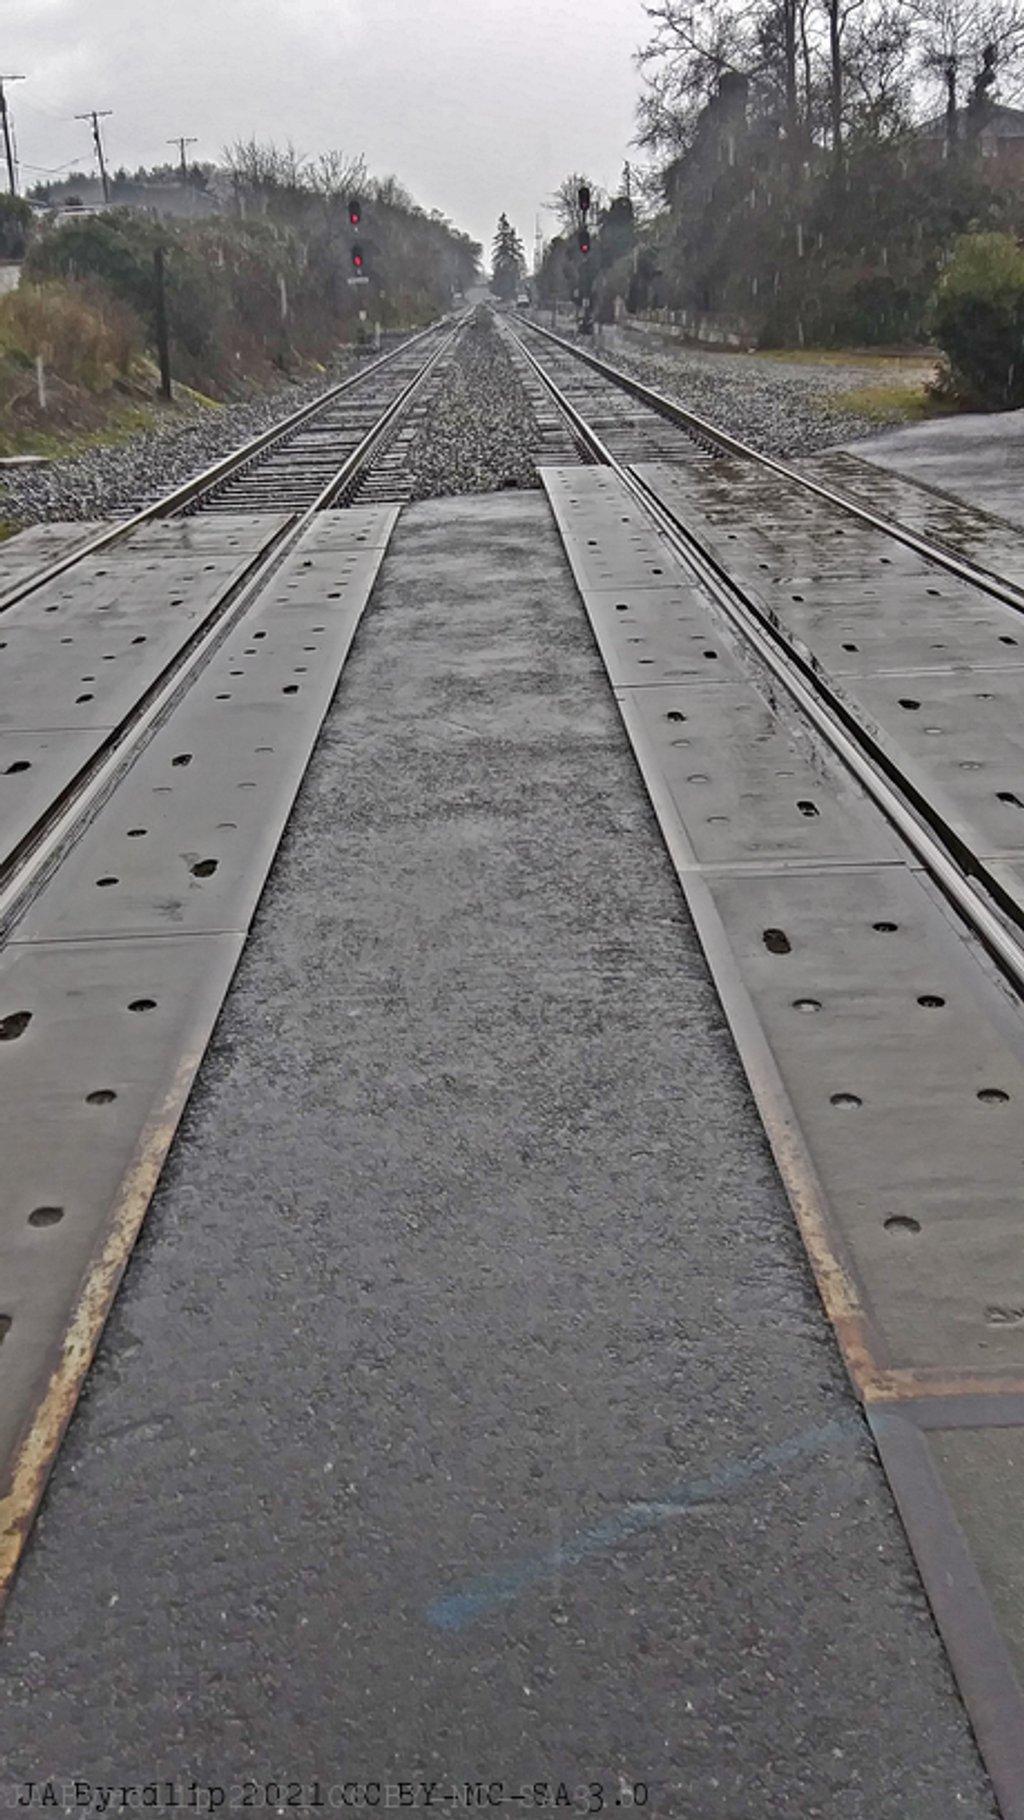 Waiting For a Train in the Rain by byrdlip